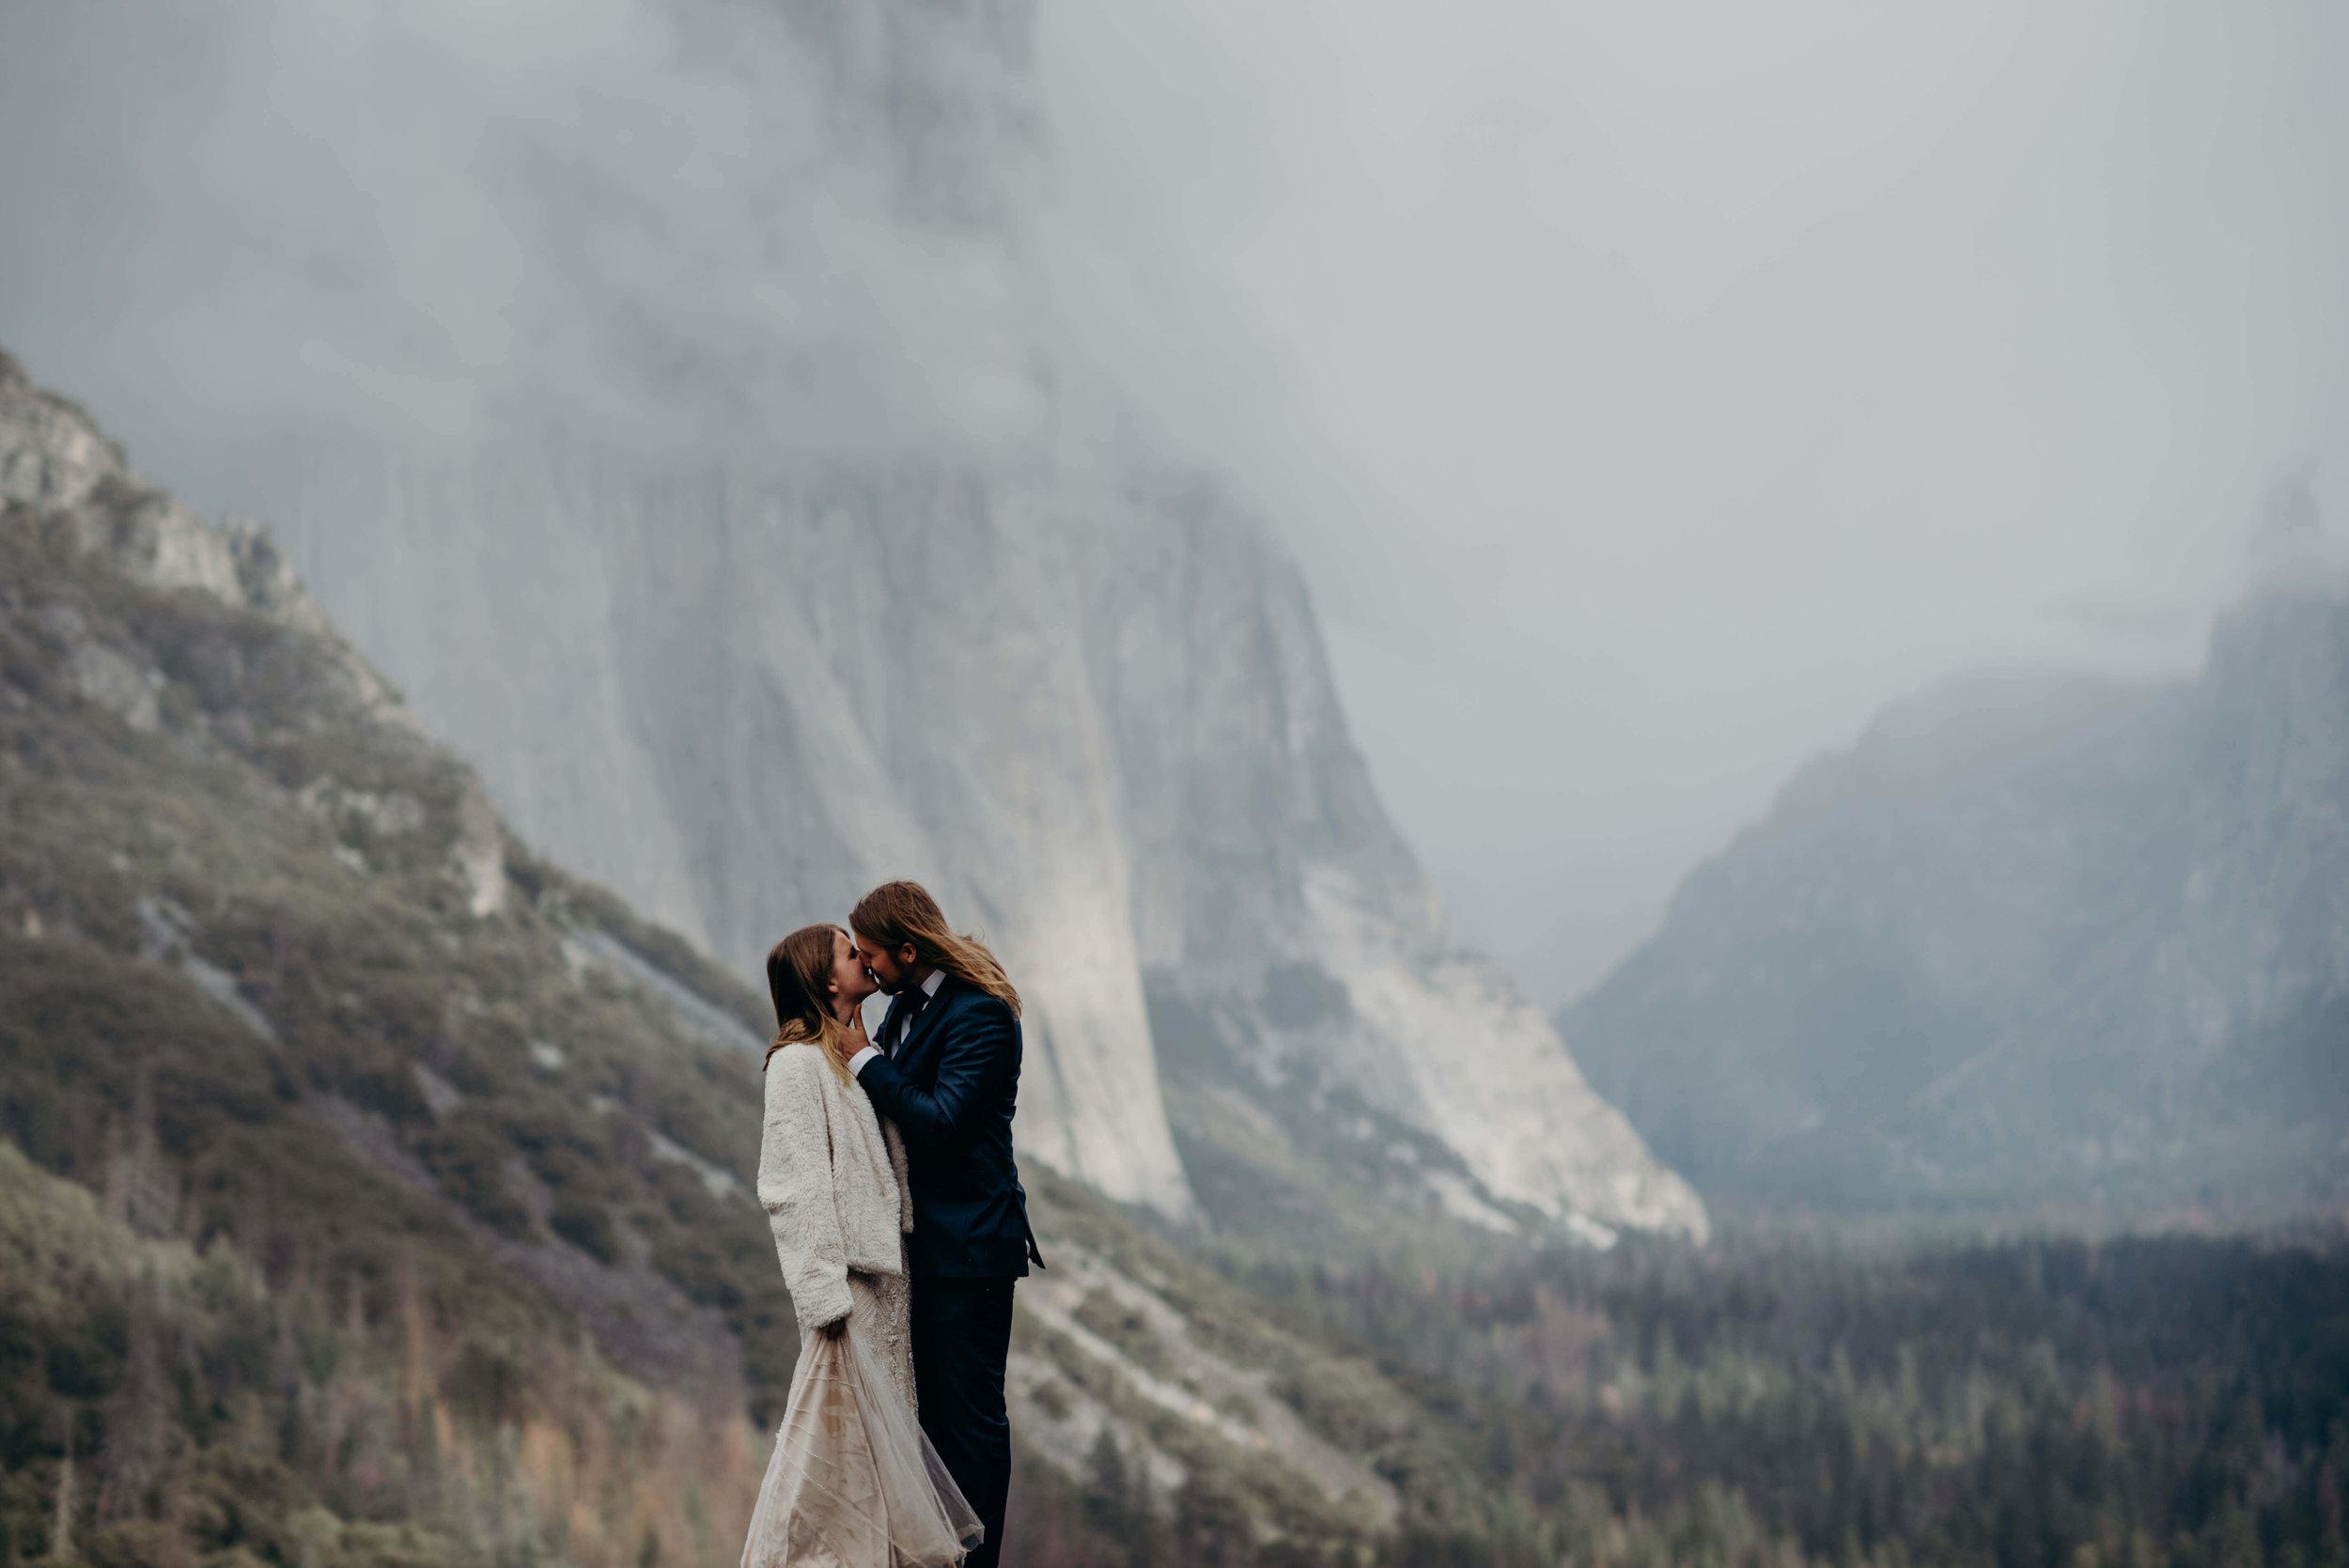 Adventure-Elopement-Yosemite-Tunnelview-6.jpg